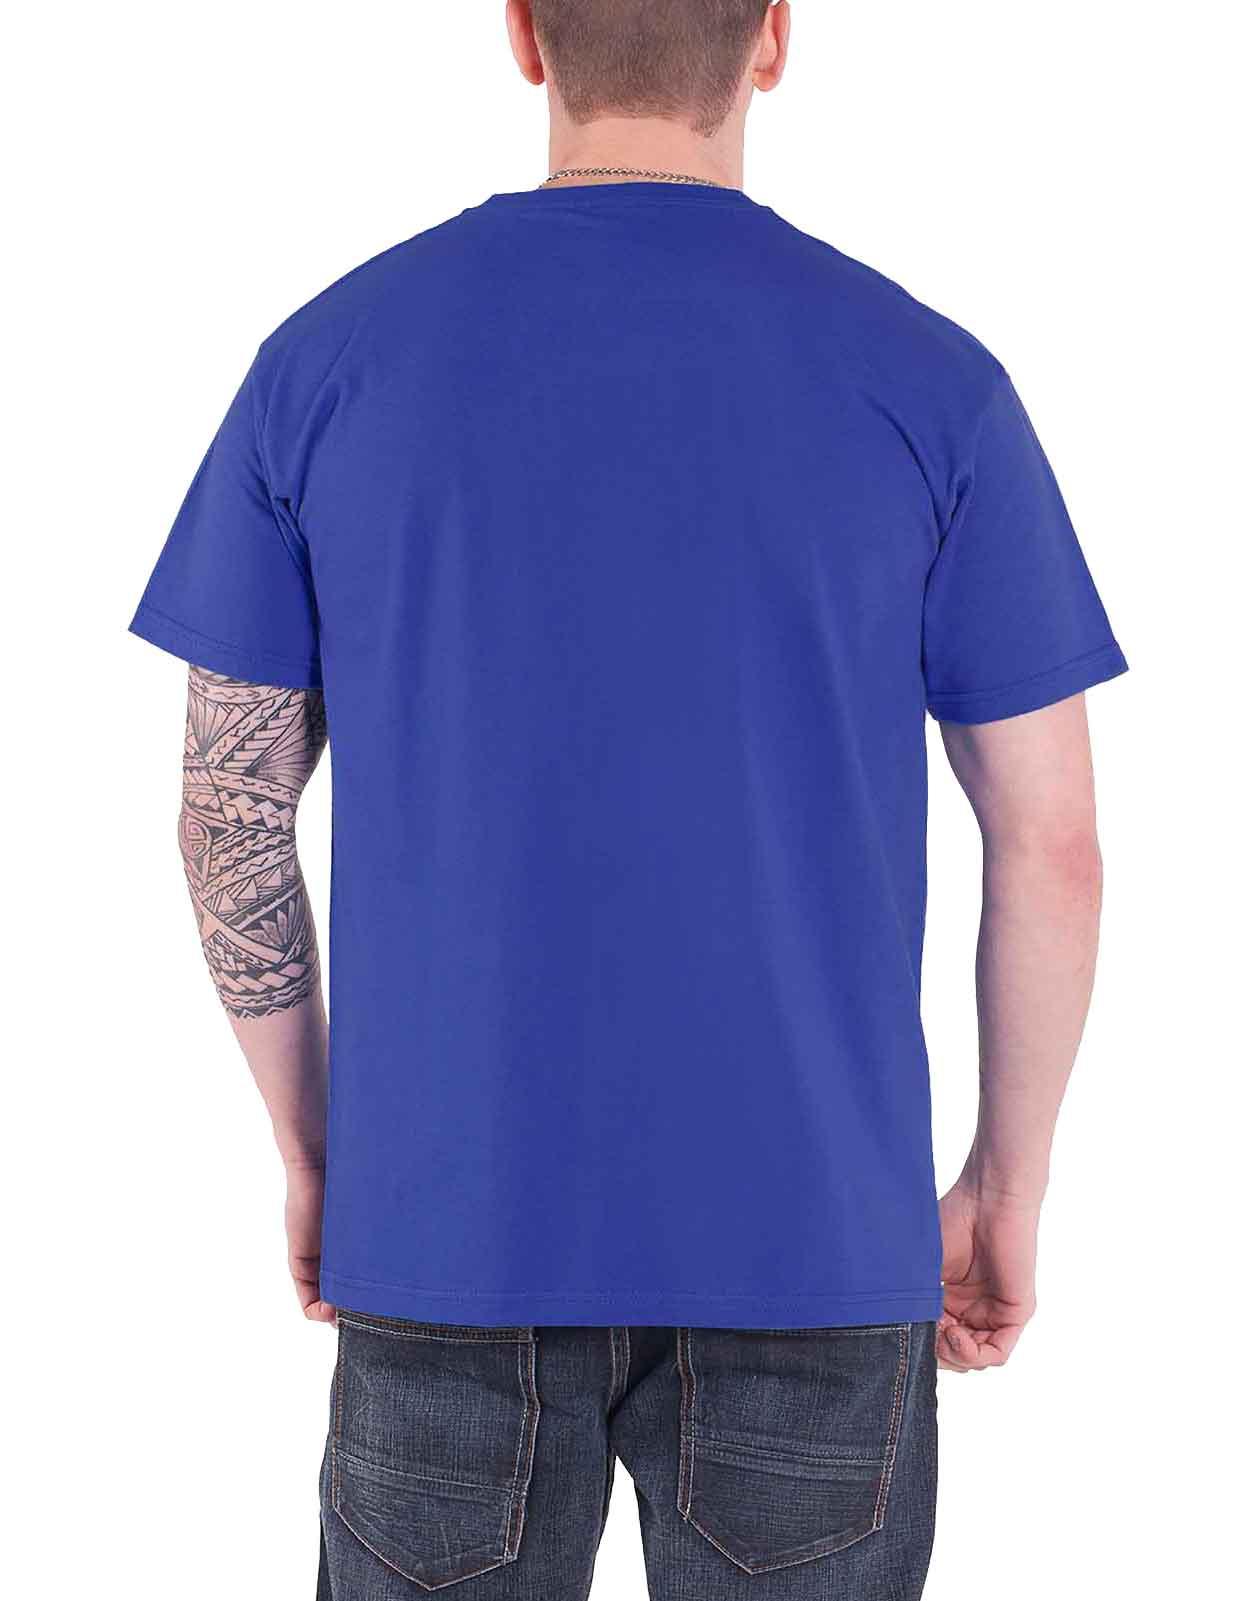 Officiel-Hawkwind-T-Shirt-Warrior-on-the-Edge-Space-Ritual-Doremi-homme-nouveau miniature 3